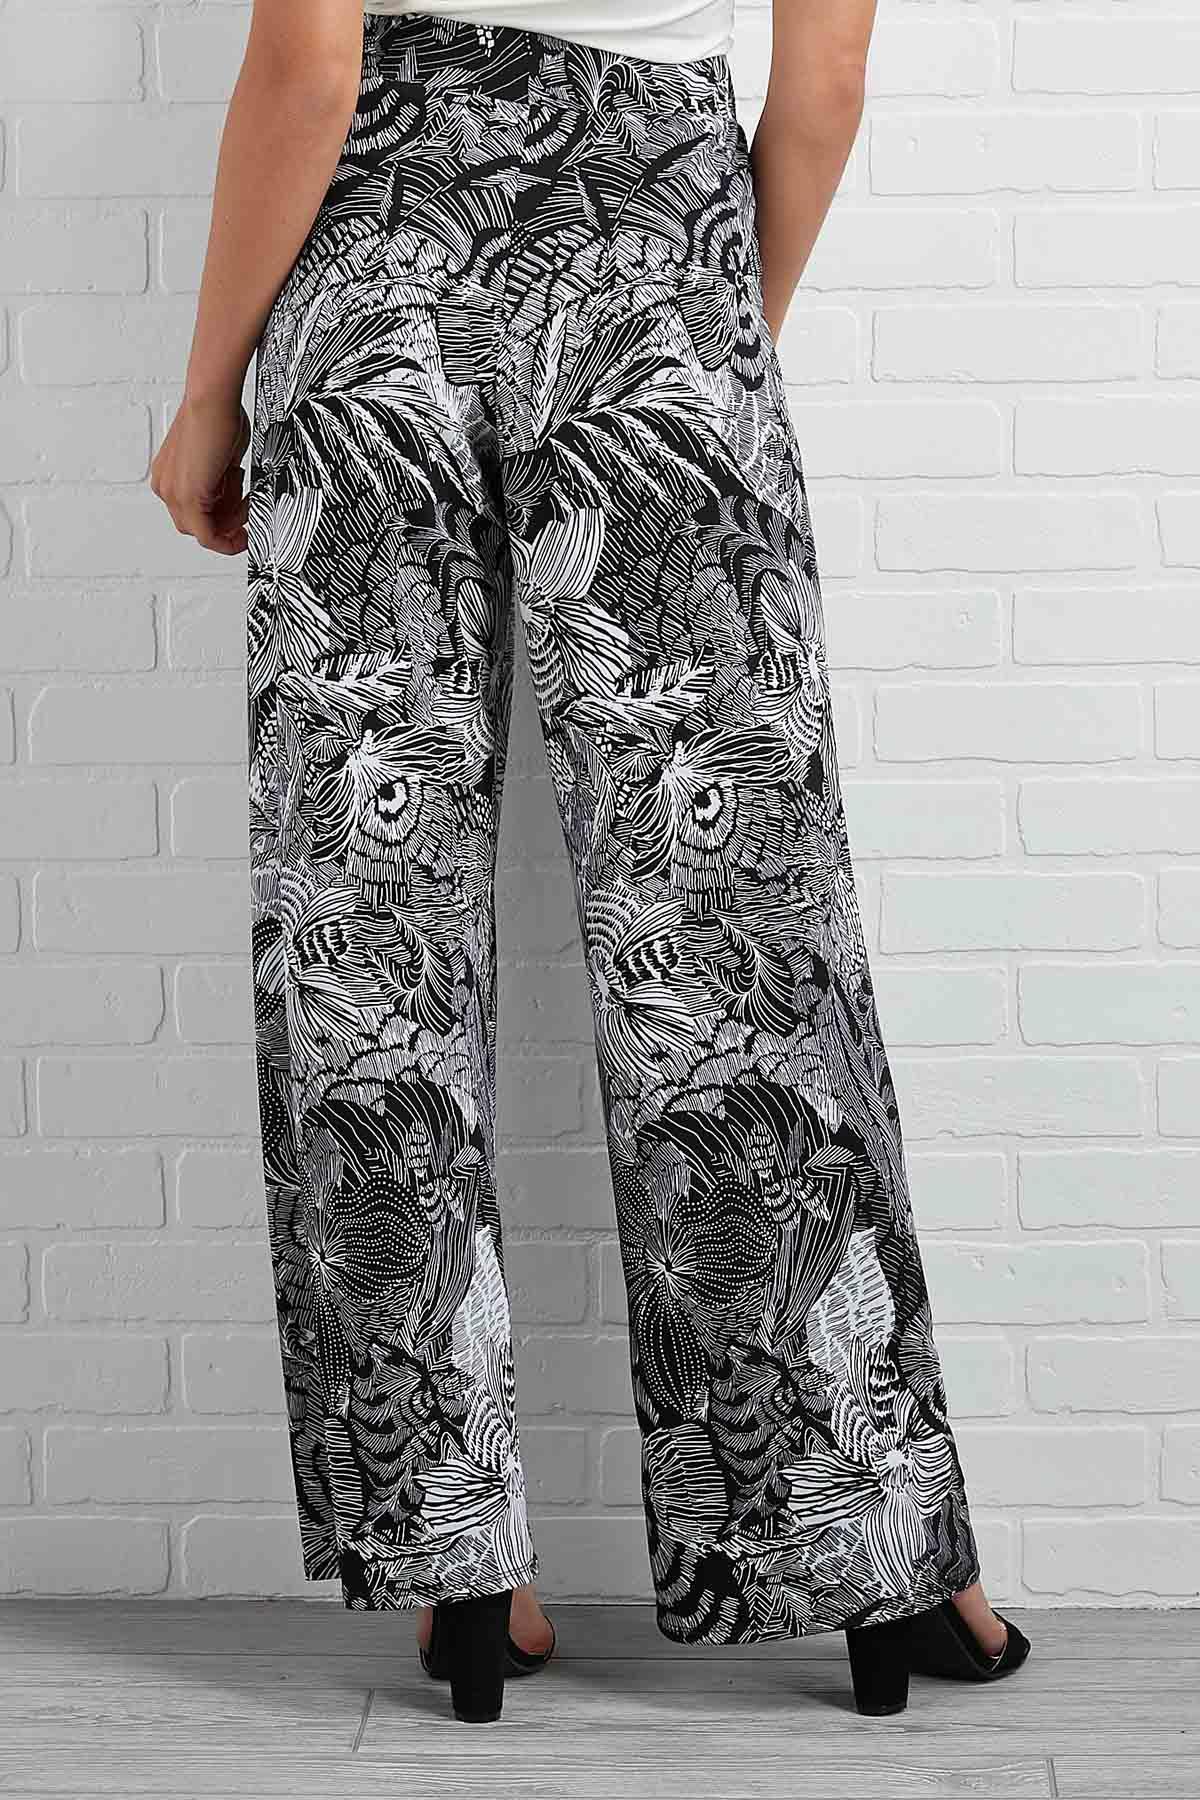 Sketch Floral Pants